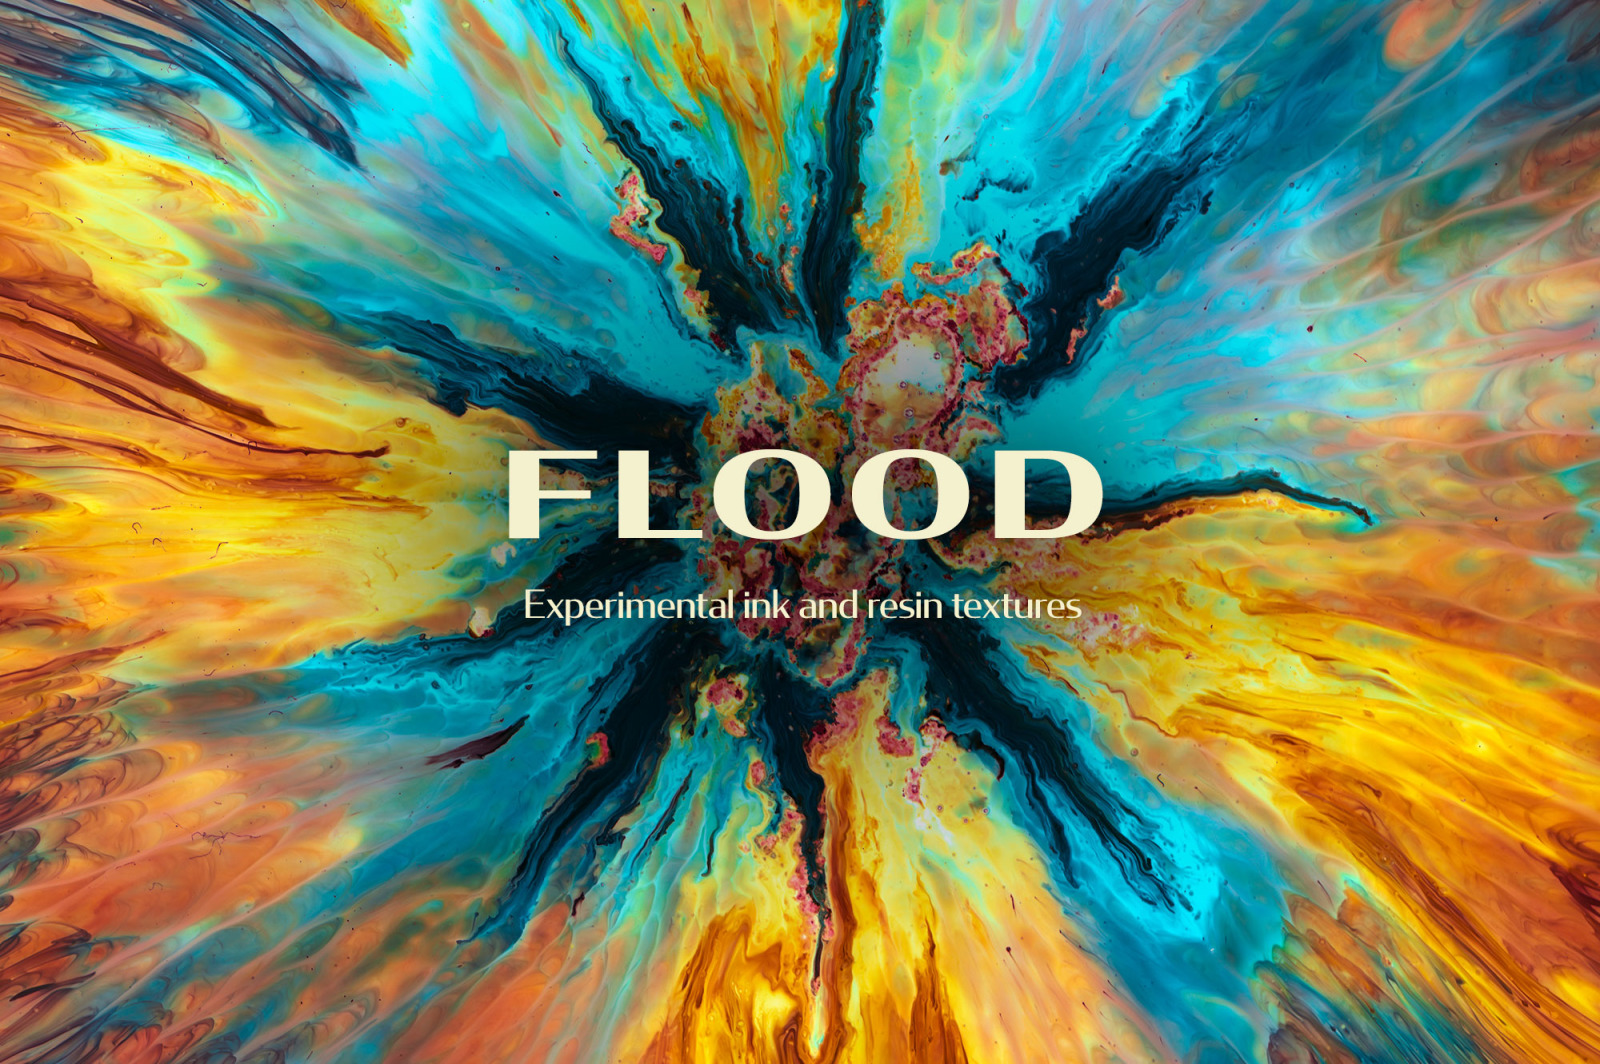 Flood: Experimental Ink & Resin Textures